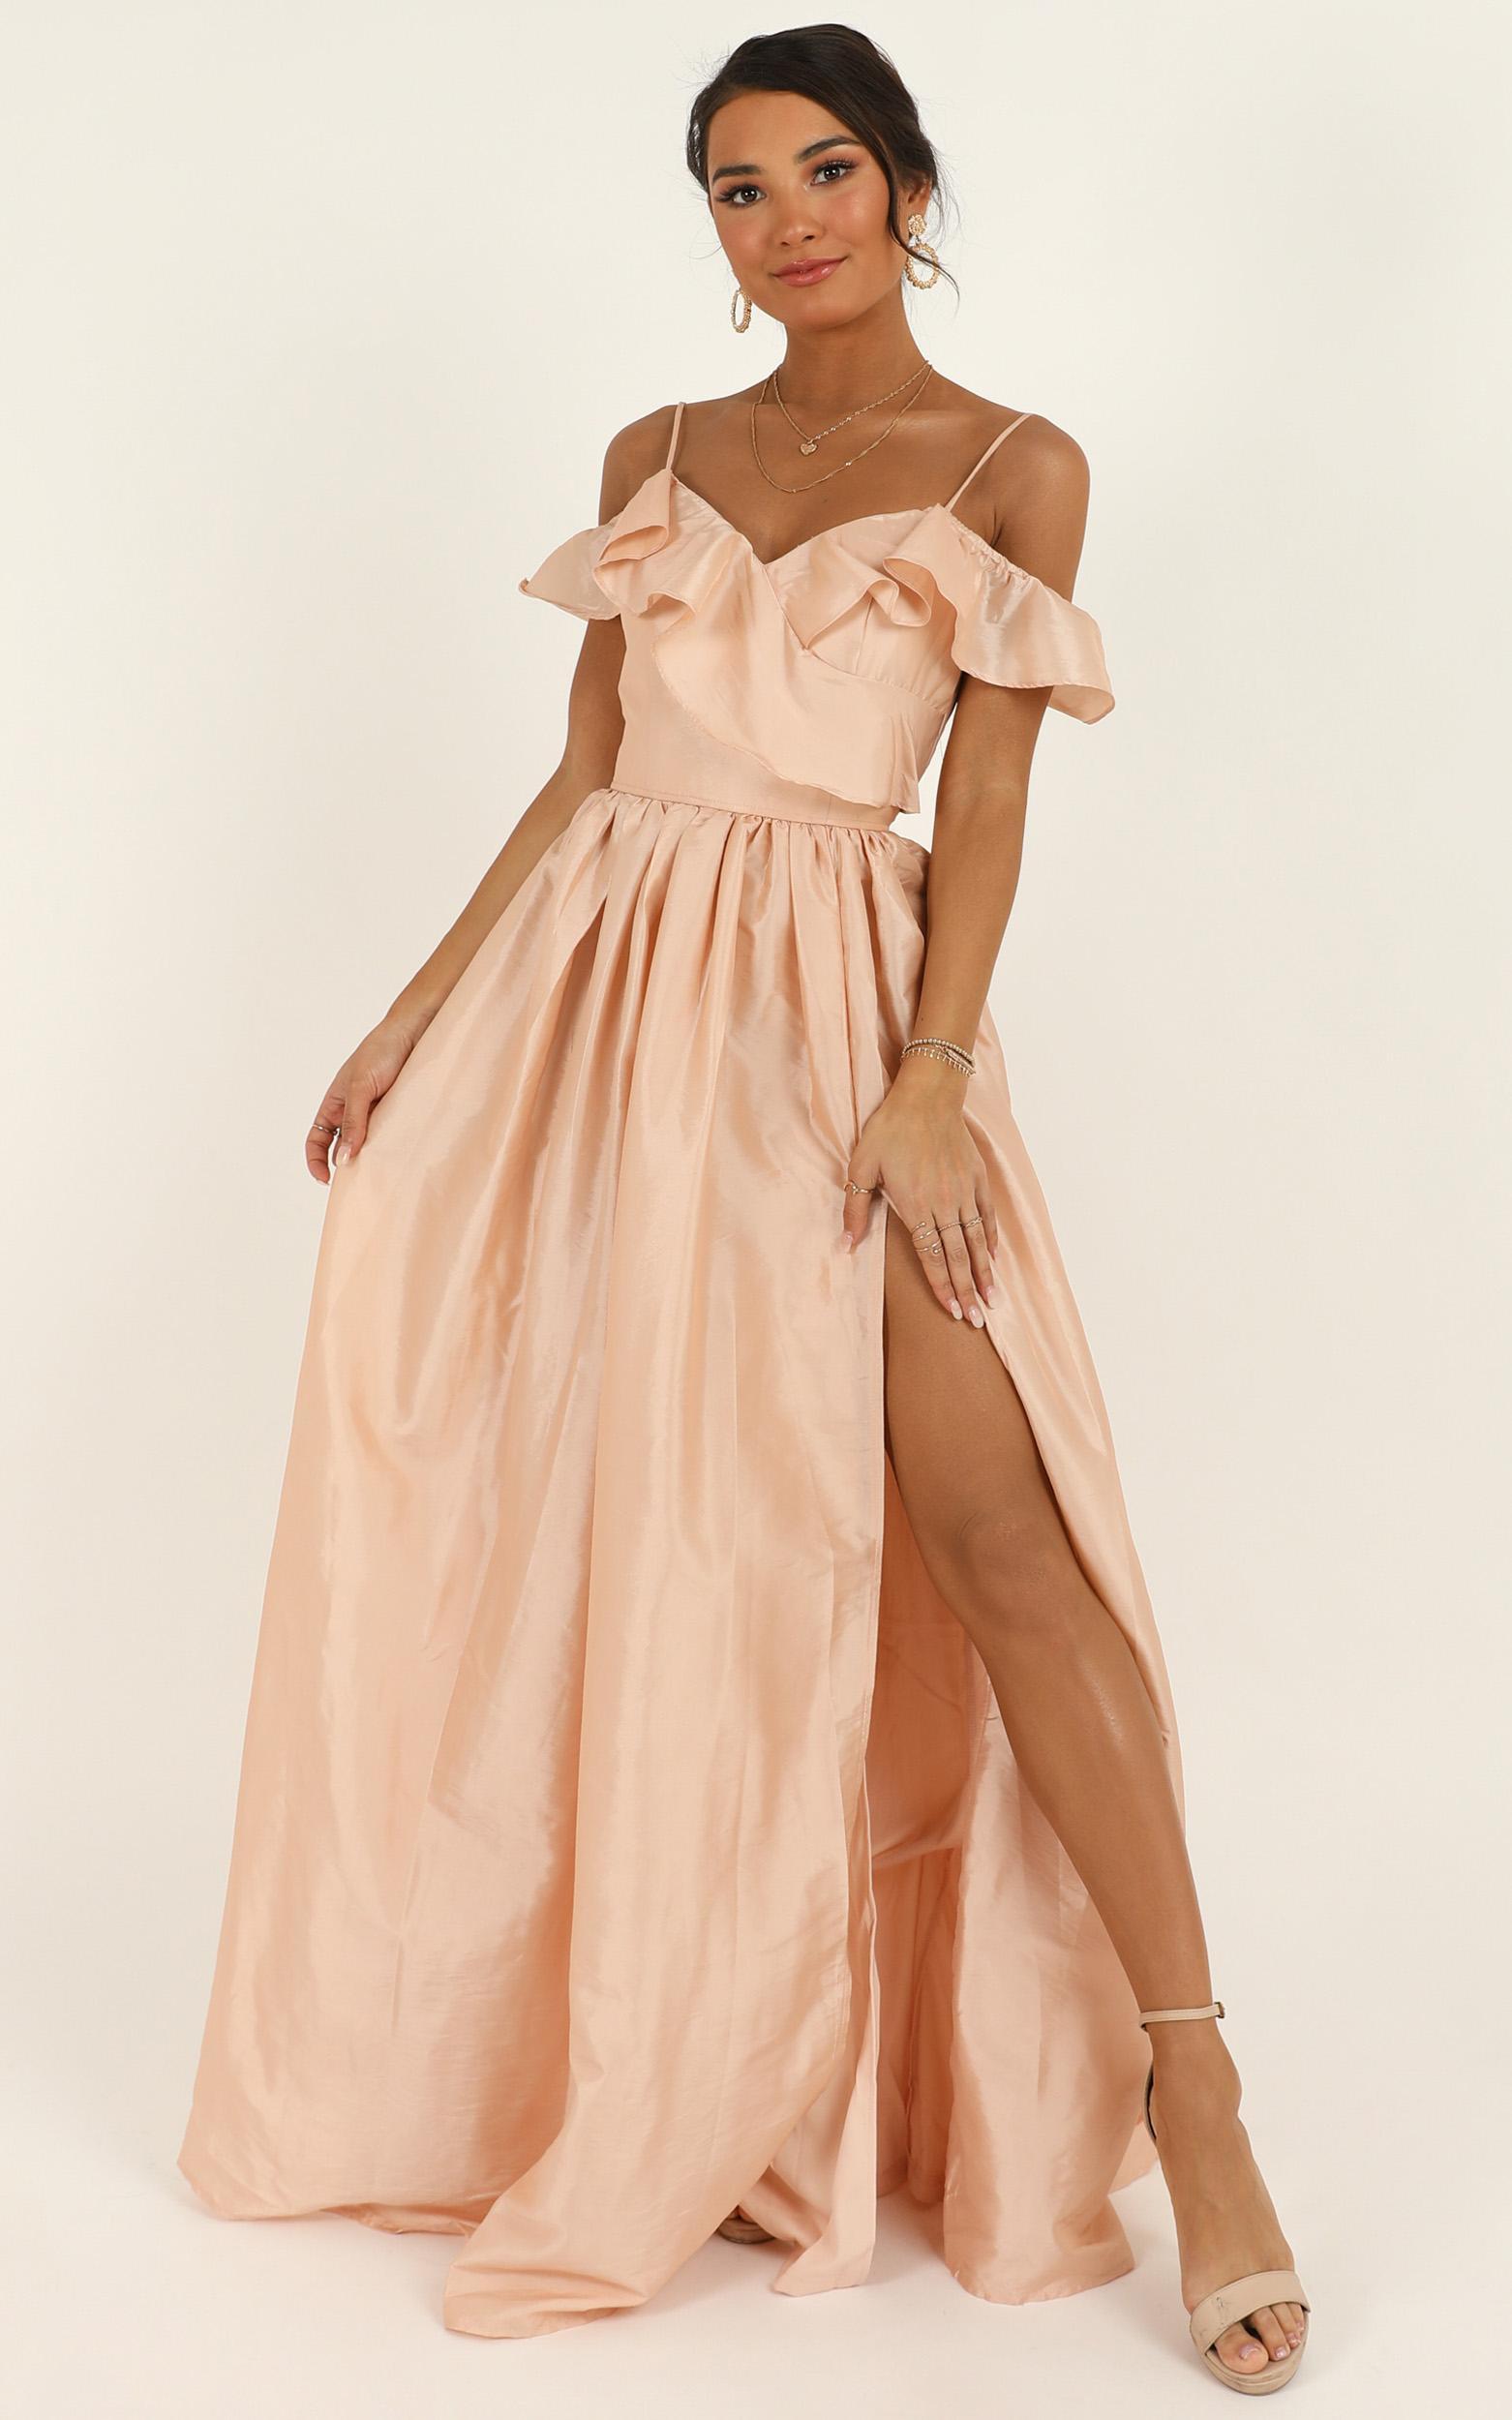 Return To Sender maxi dress in blush - 12 (L), Blush, hi-res image number null